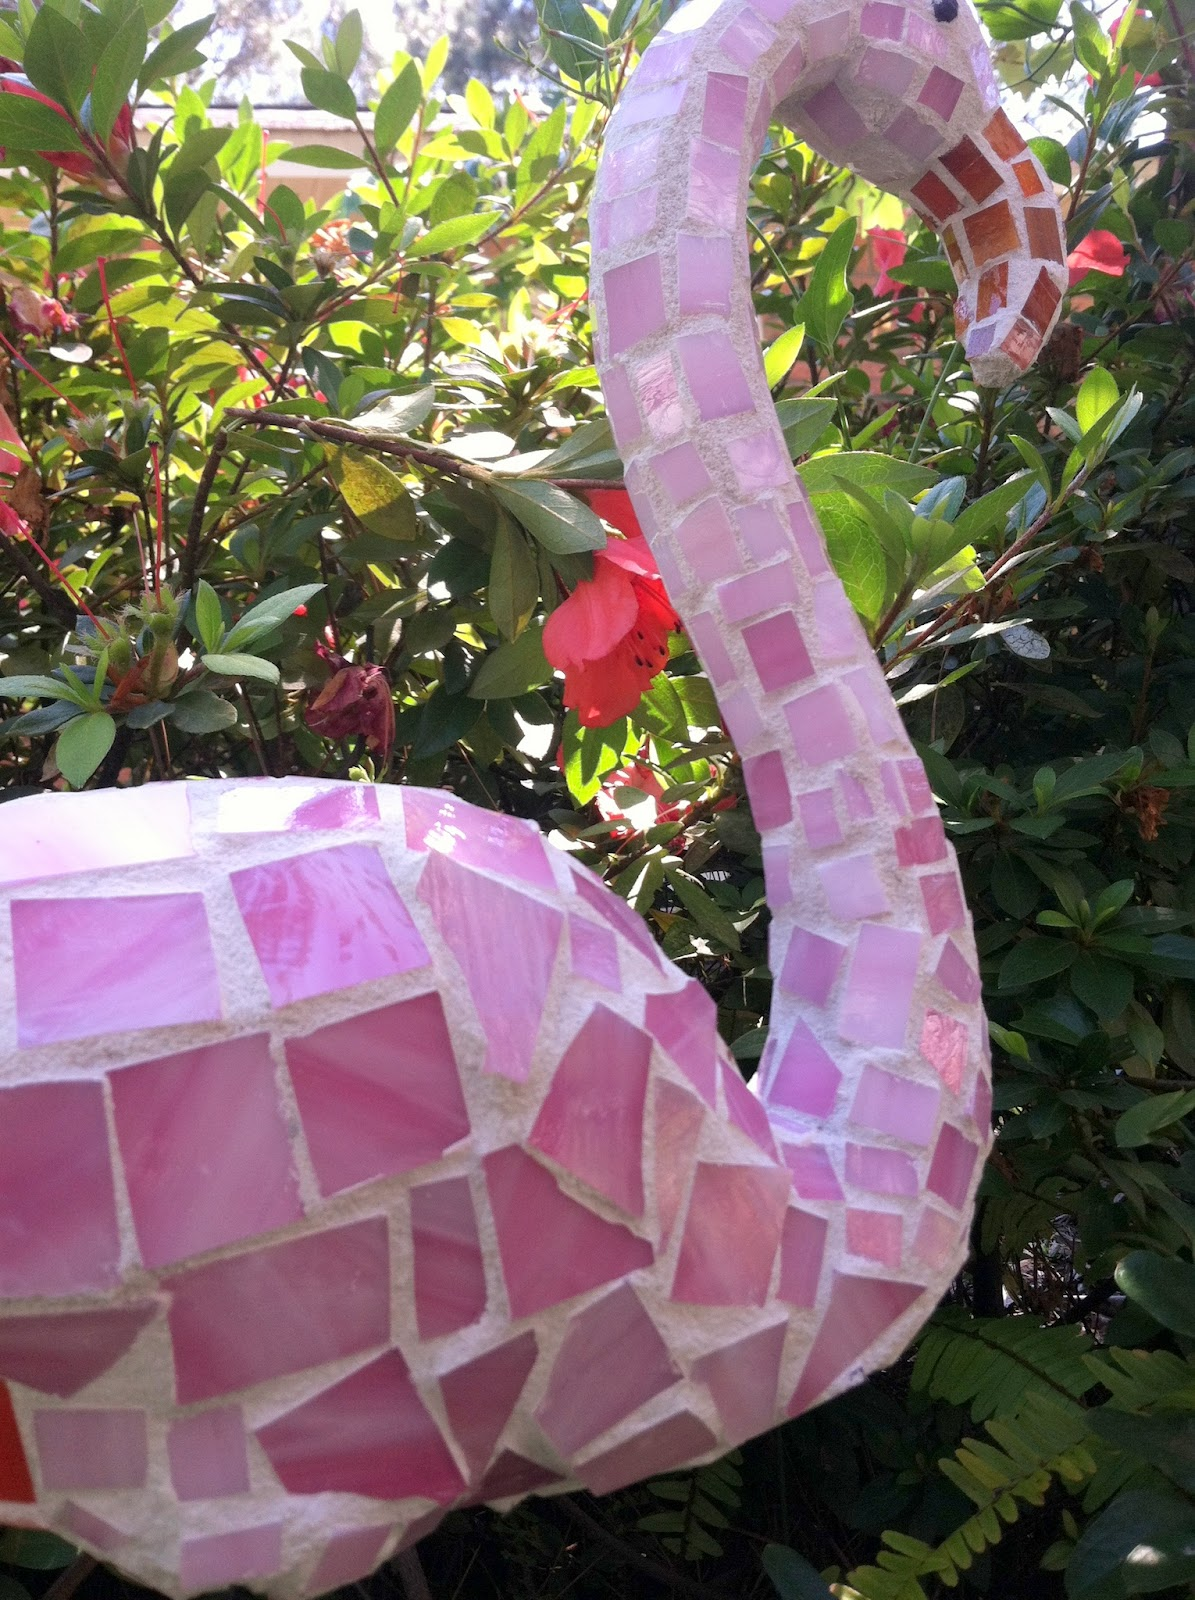 Mosaic Ideas For The Garden Flamingo mosaic garden art made from plastic pink dollar store pink flamingo mosaic workwithnaturefo